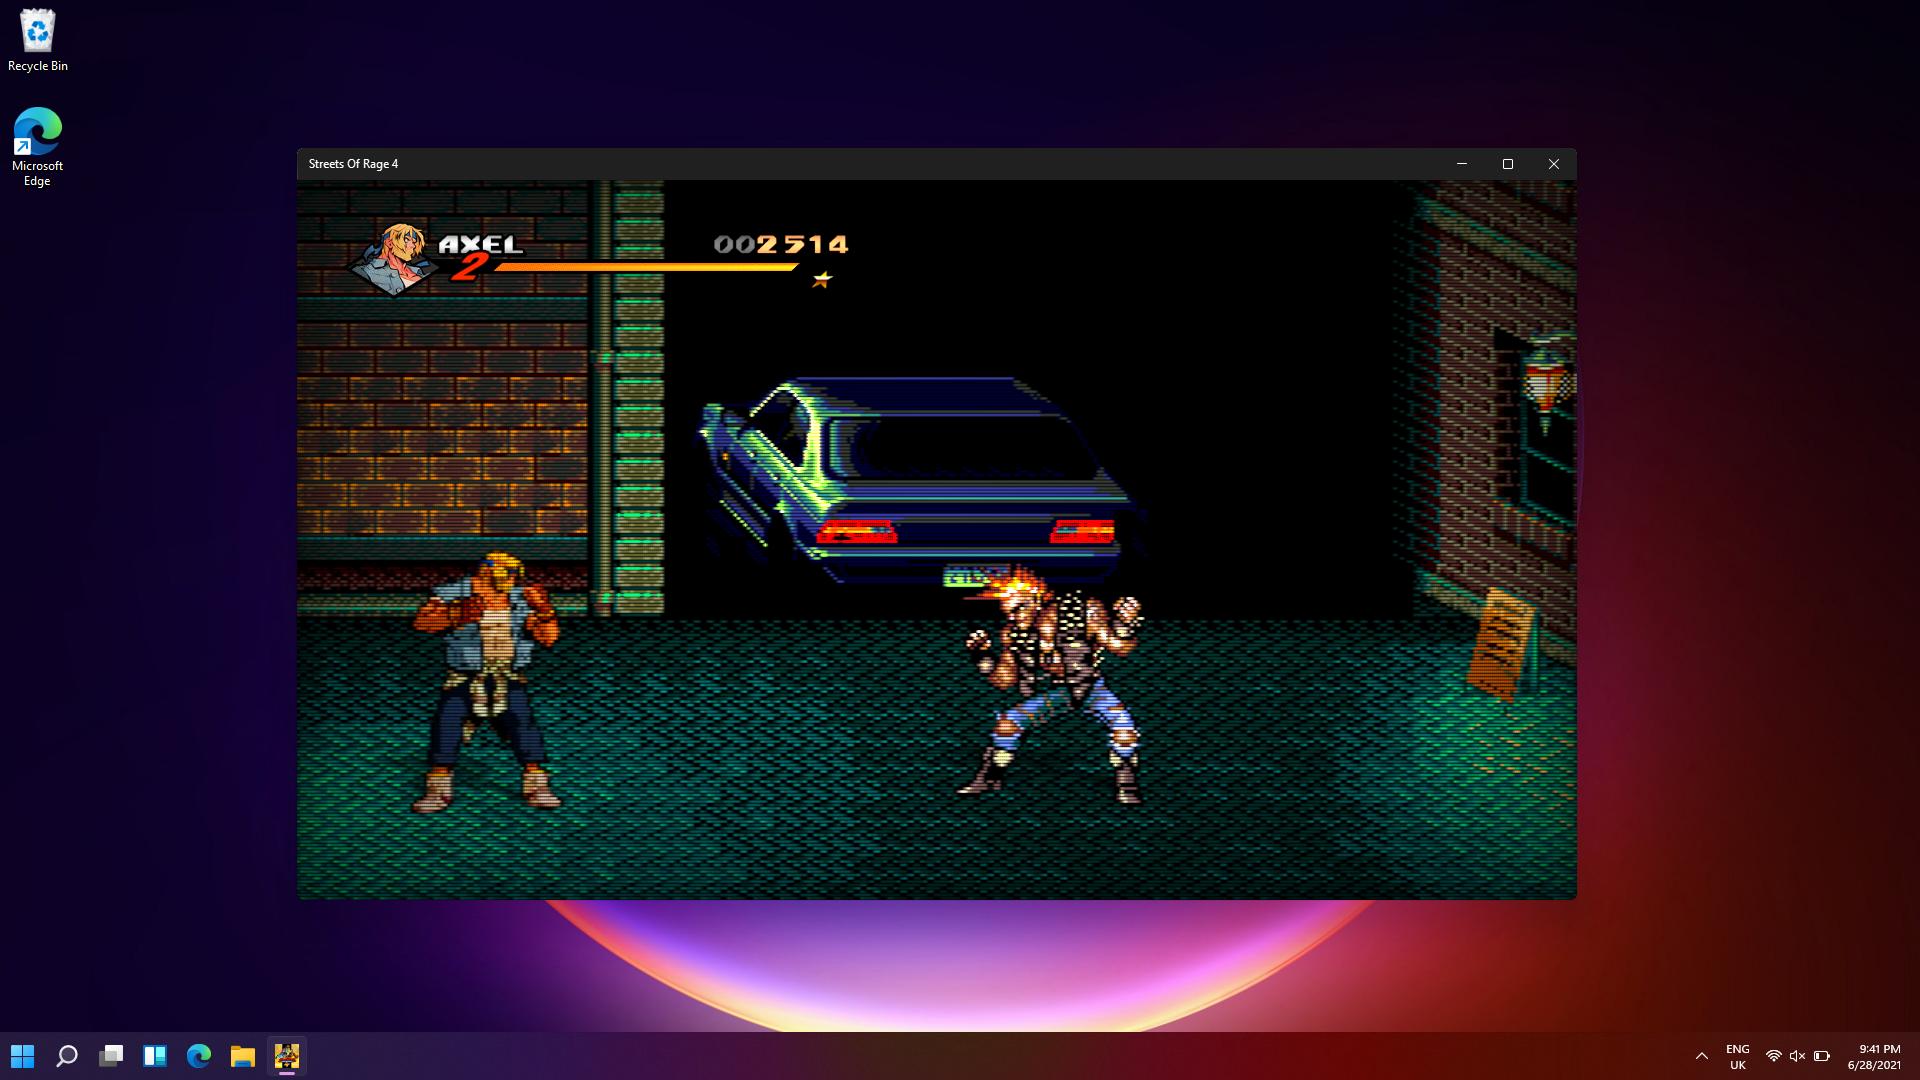 Streets of Rage 4 running on Windows 11